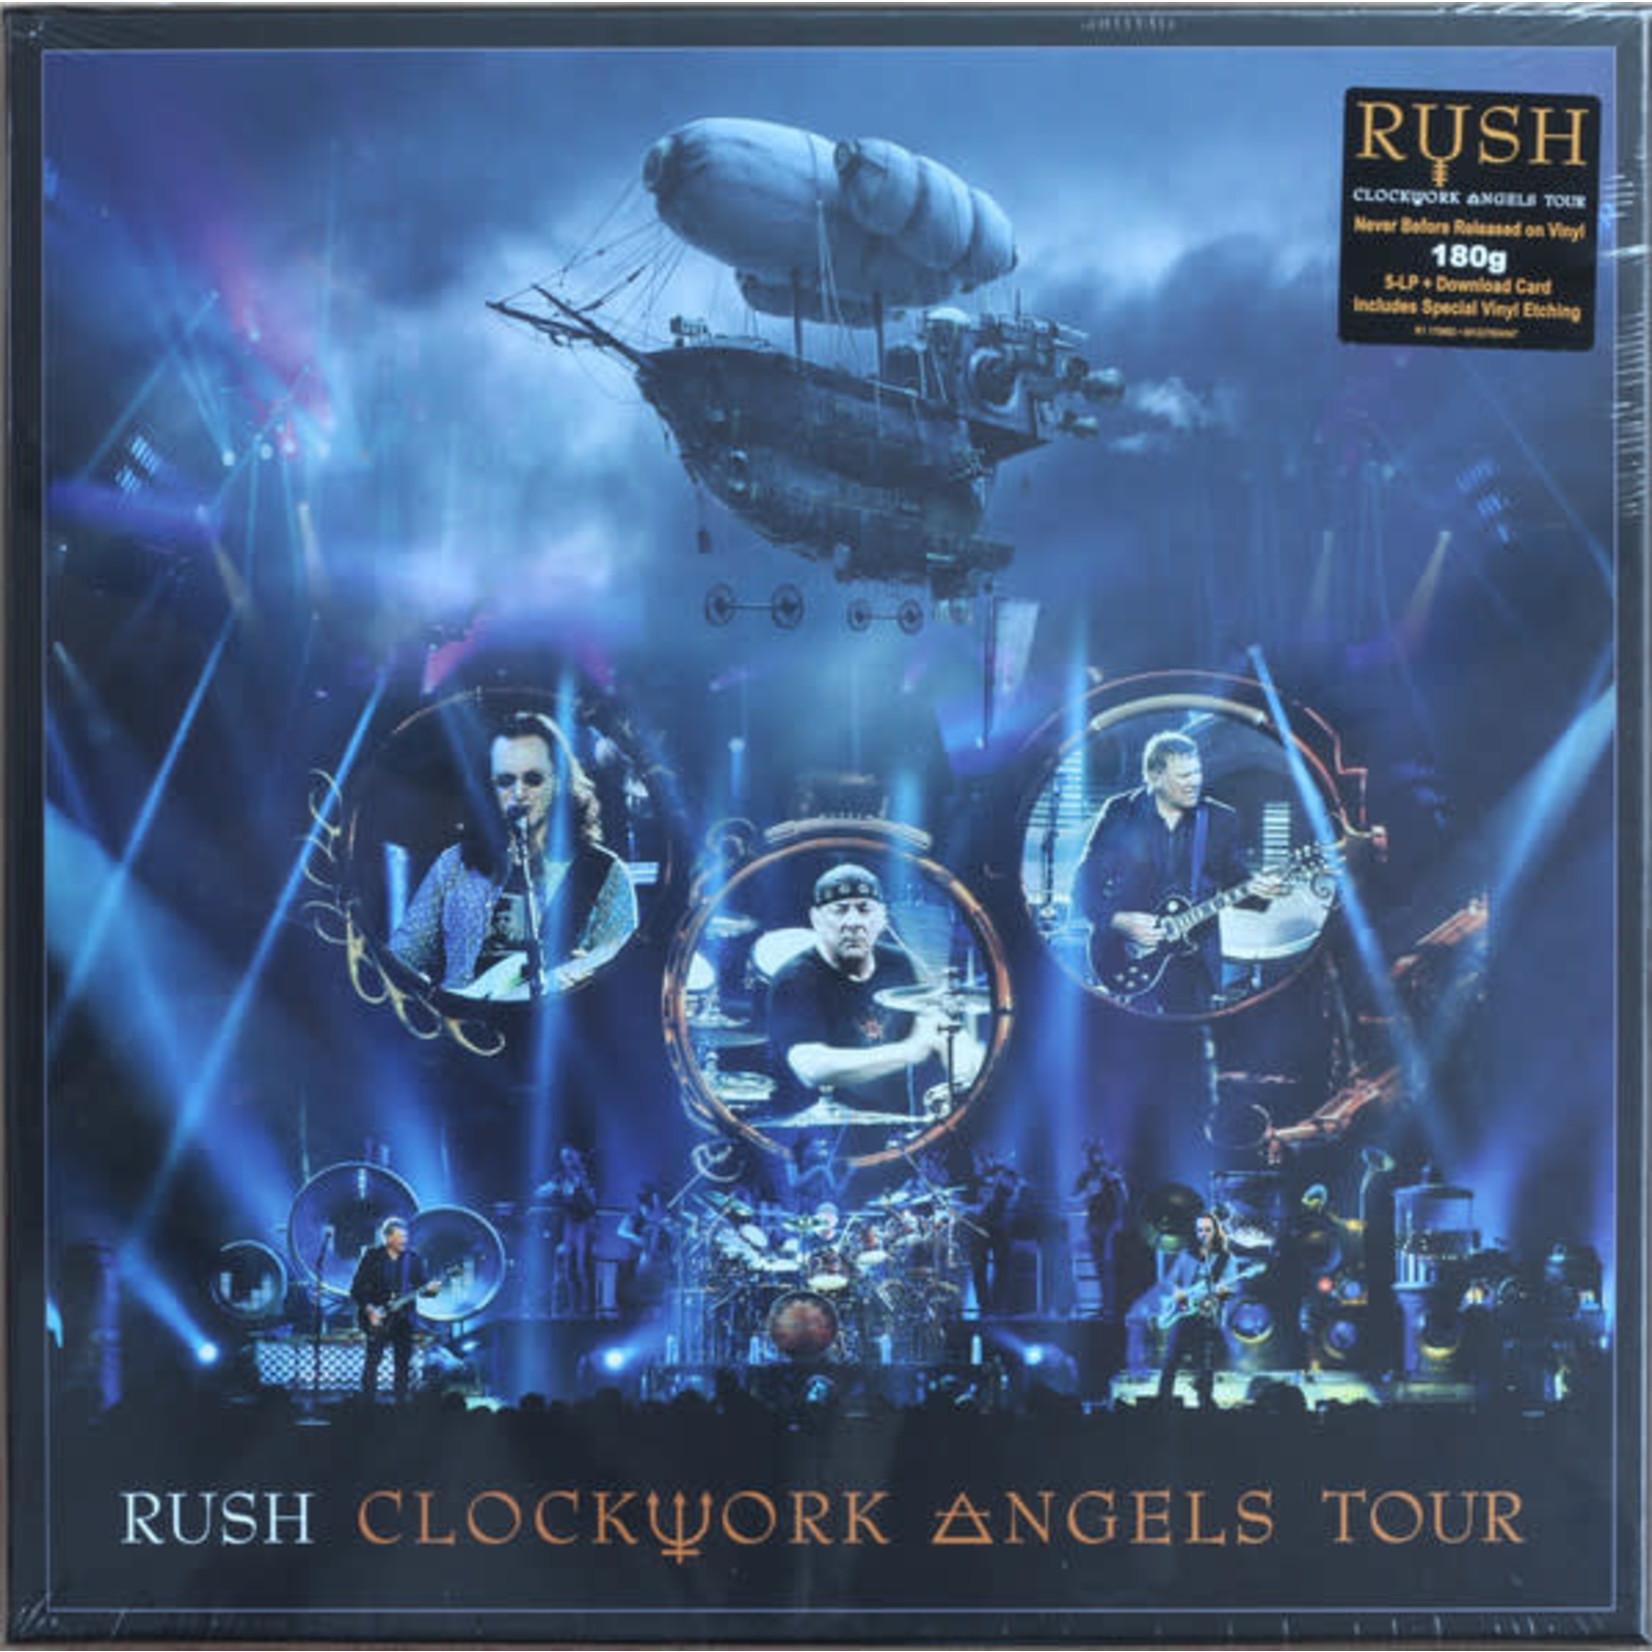 RUSH CLOCKWORK ANGELS TOUR  5LP SET